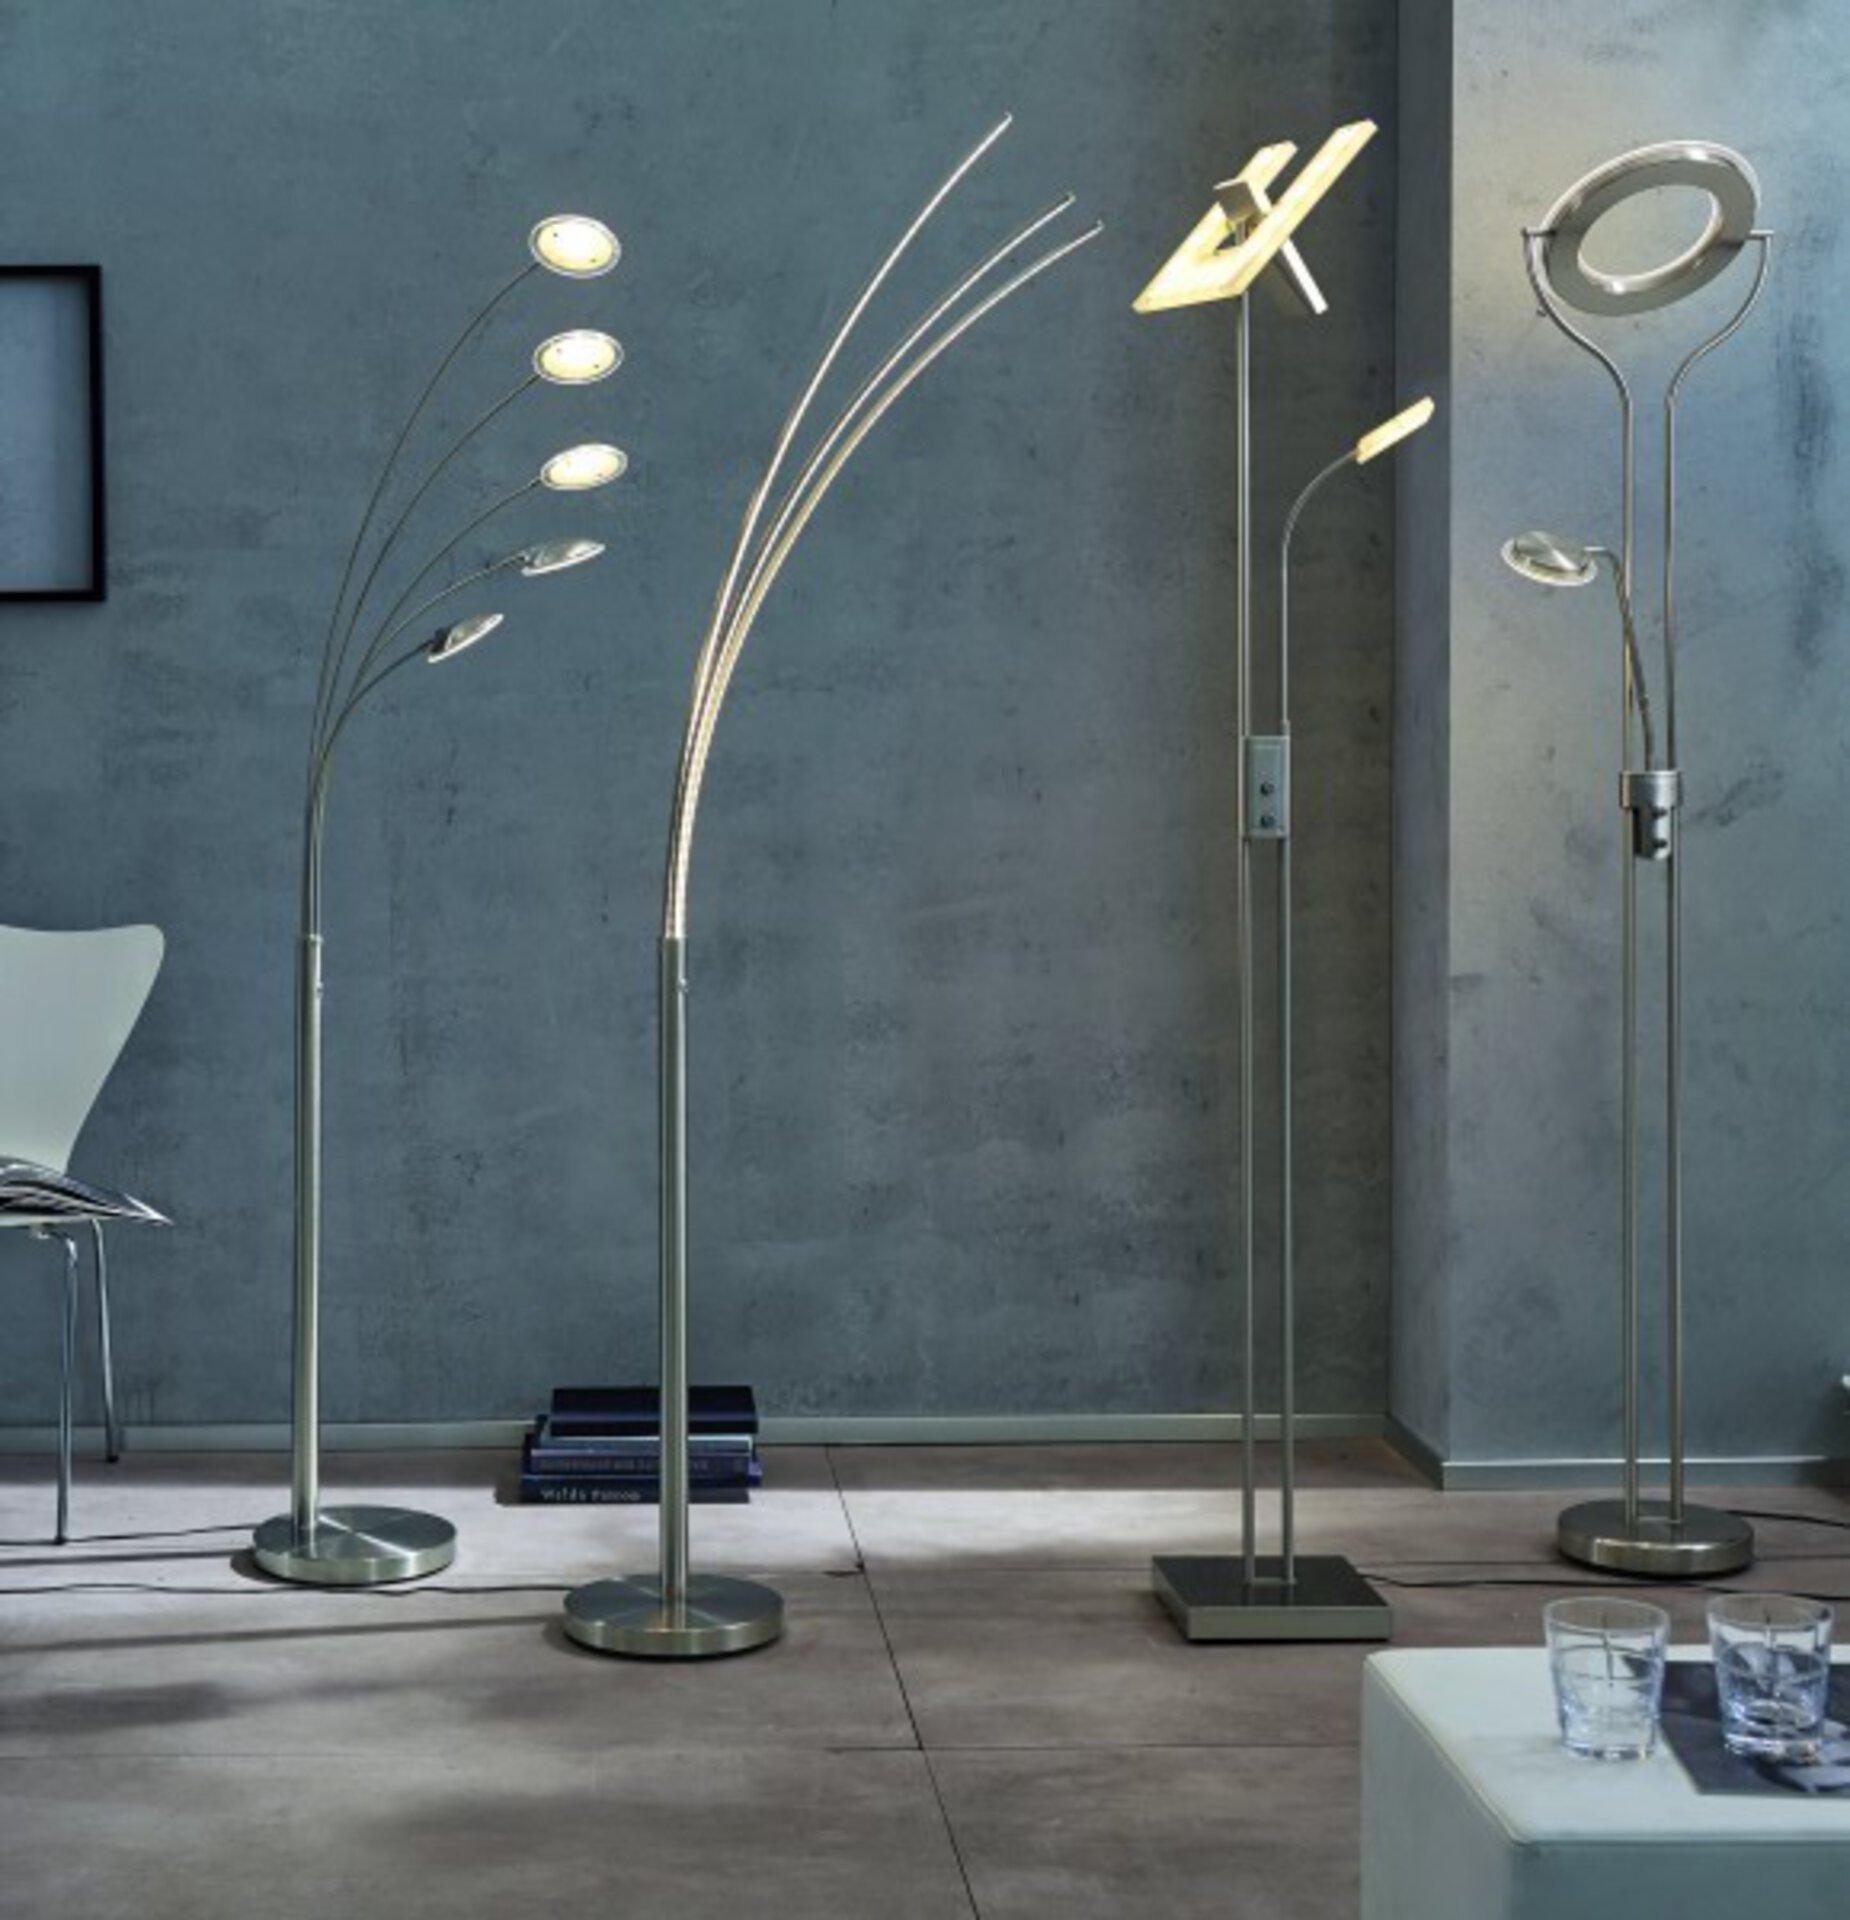 Stehleuchte Tristar Casa Nova Metall 28 x 190 x 28 cm